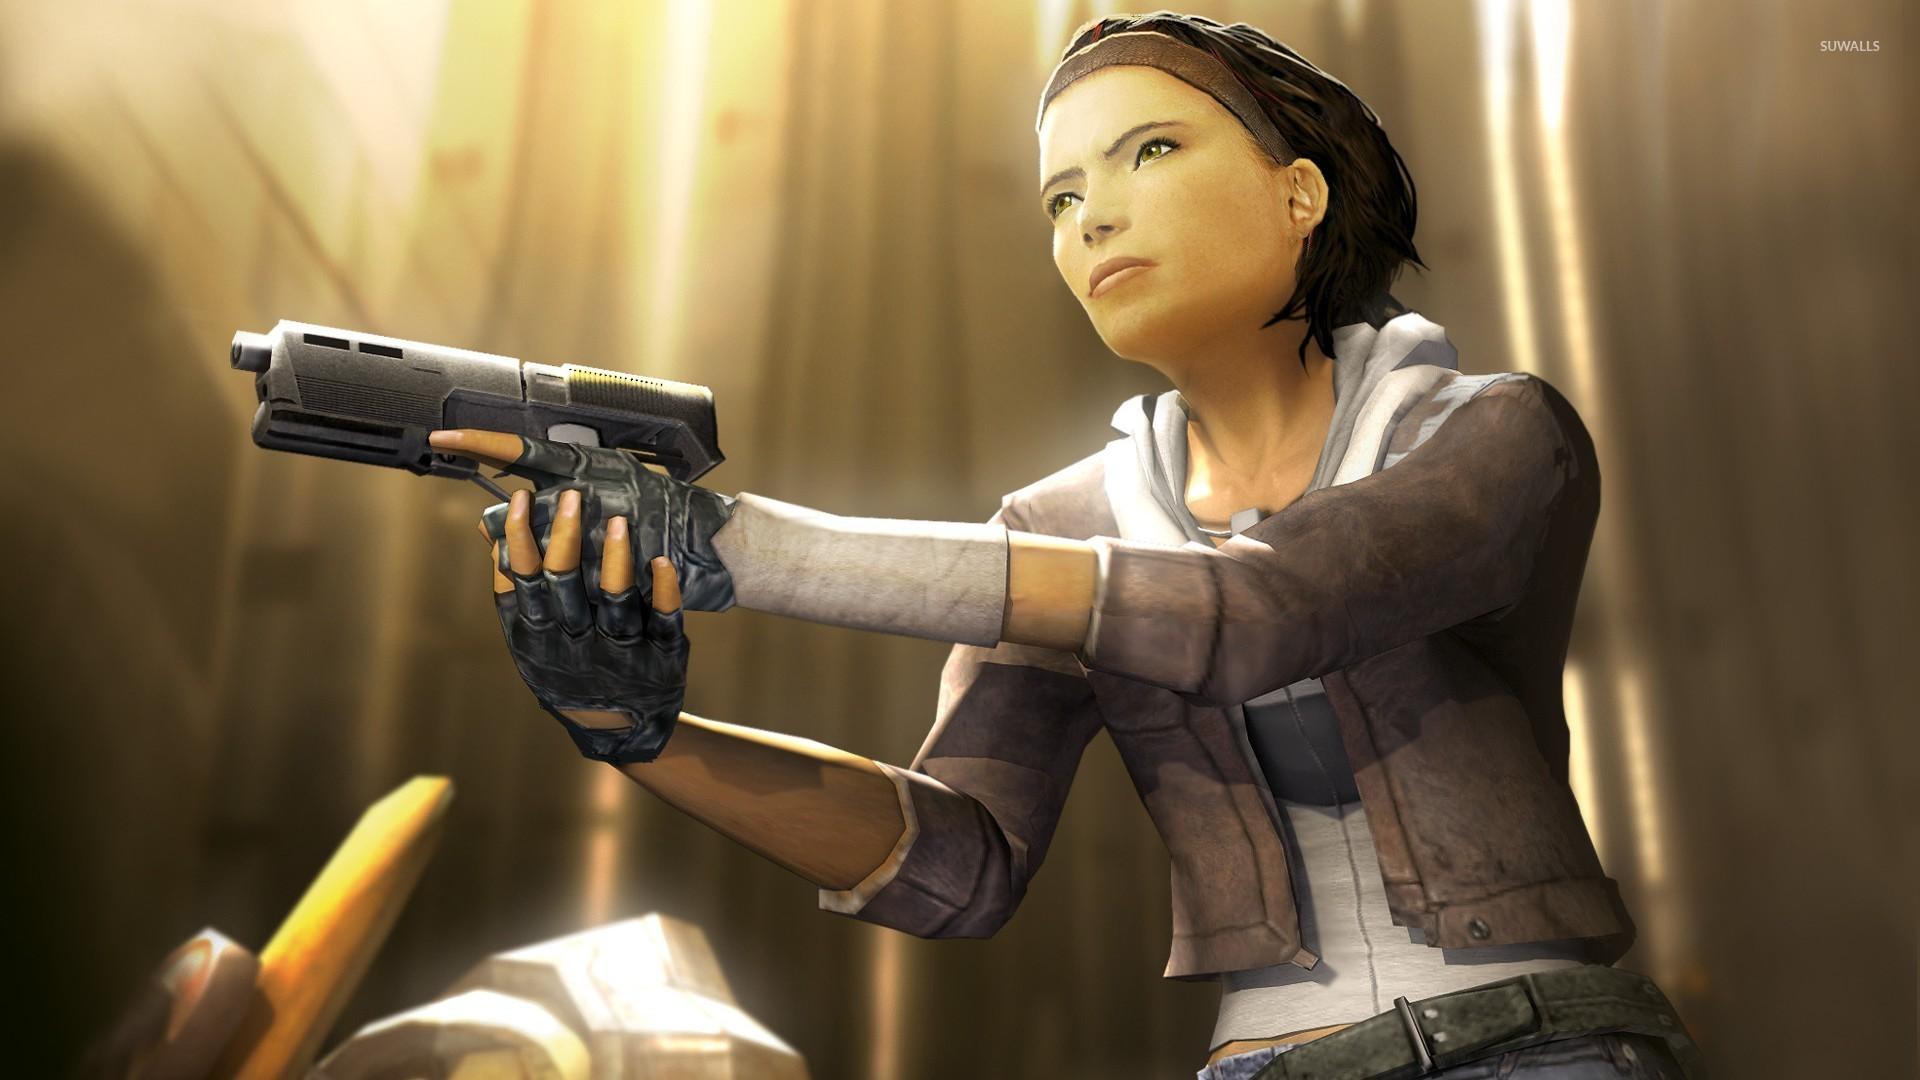 Alyx Vance Half Life 2 Wallpaper Game Wallpapers 20746